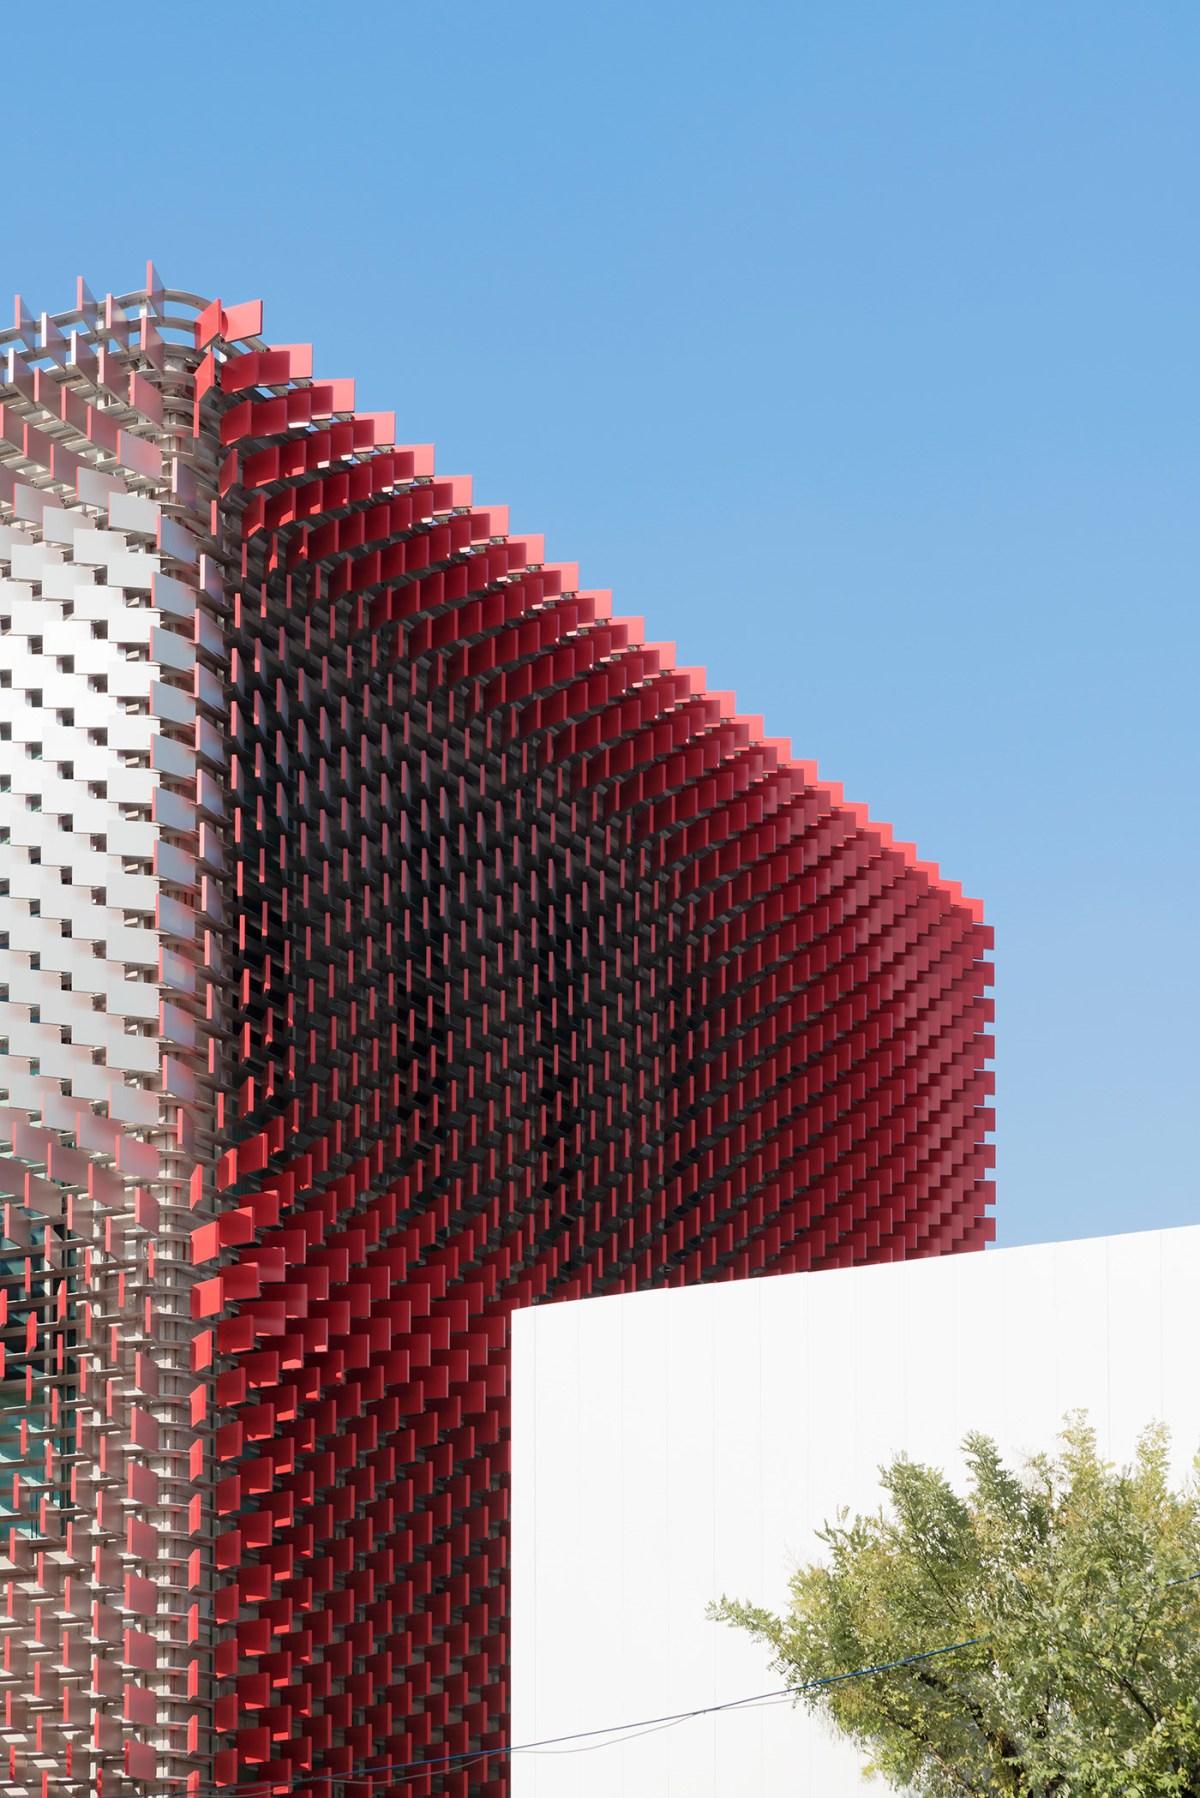 Andrés-Gallardo-Albajar-Ubrna-Geometry-5